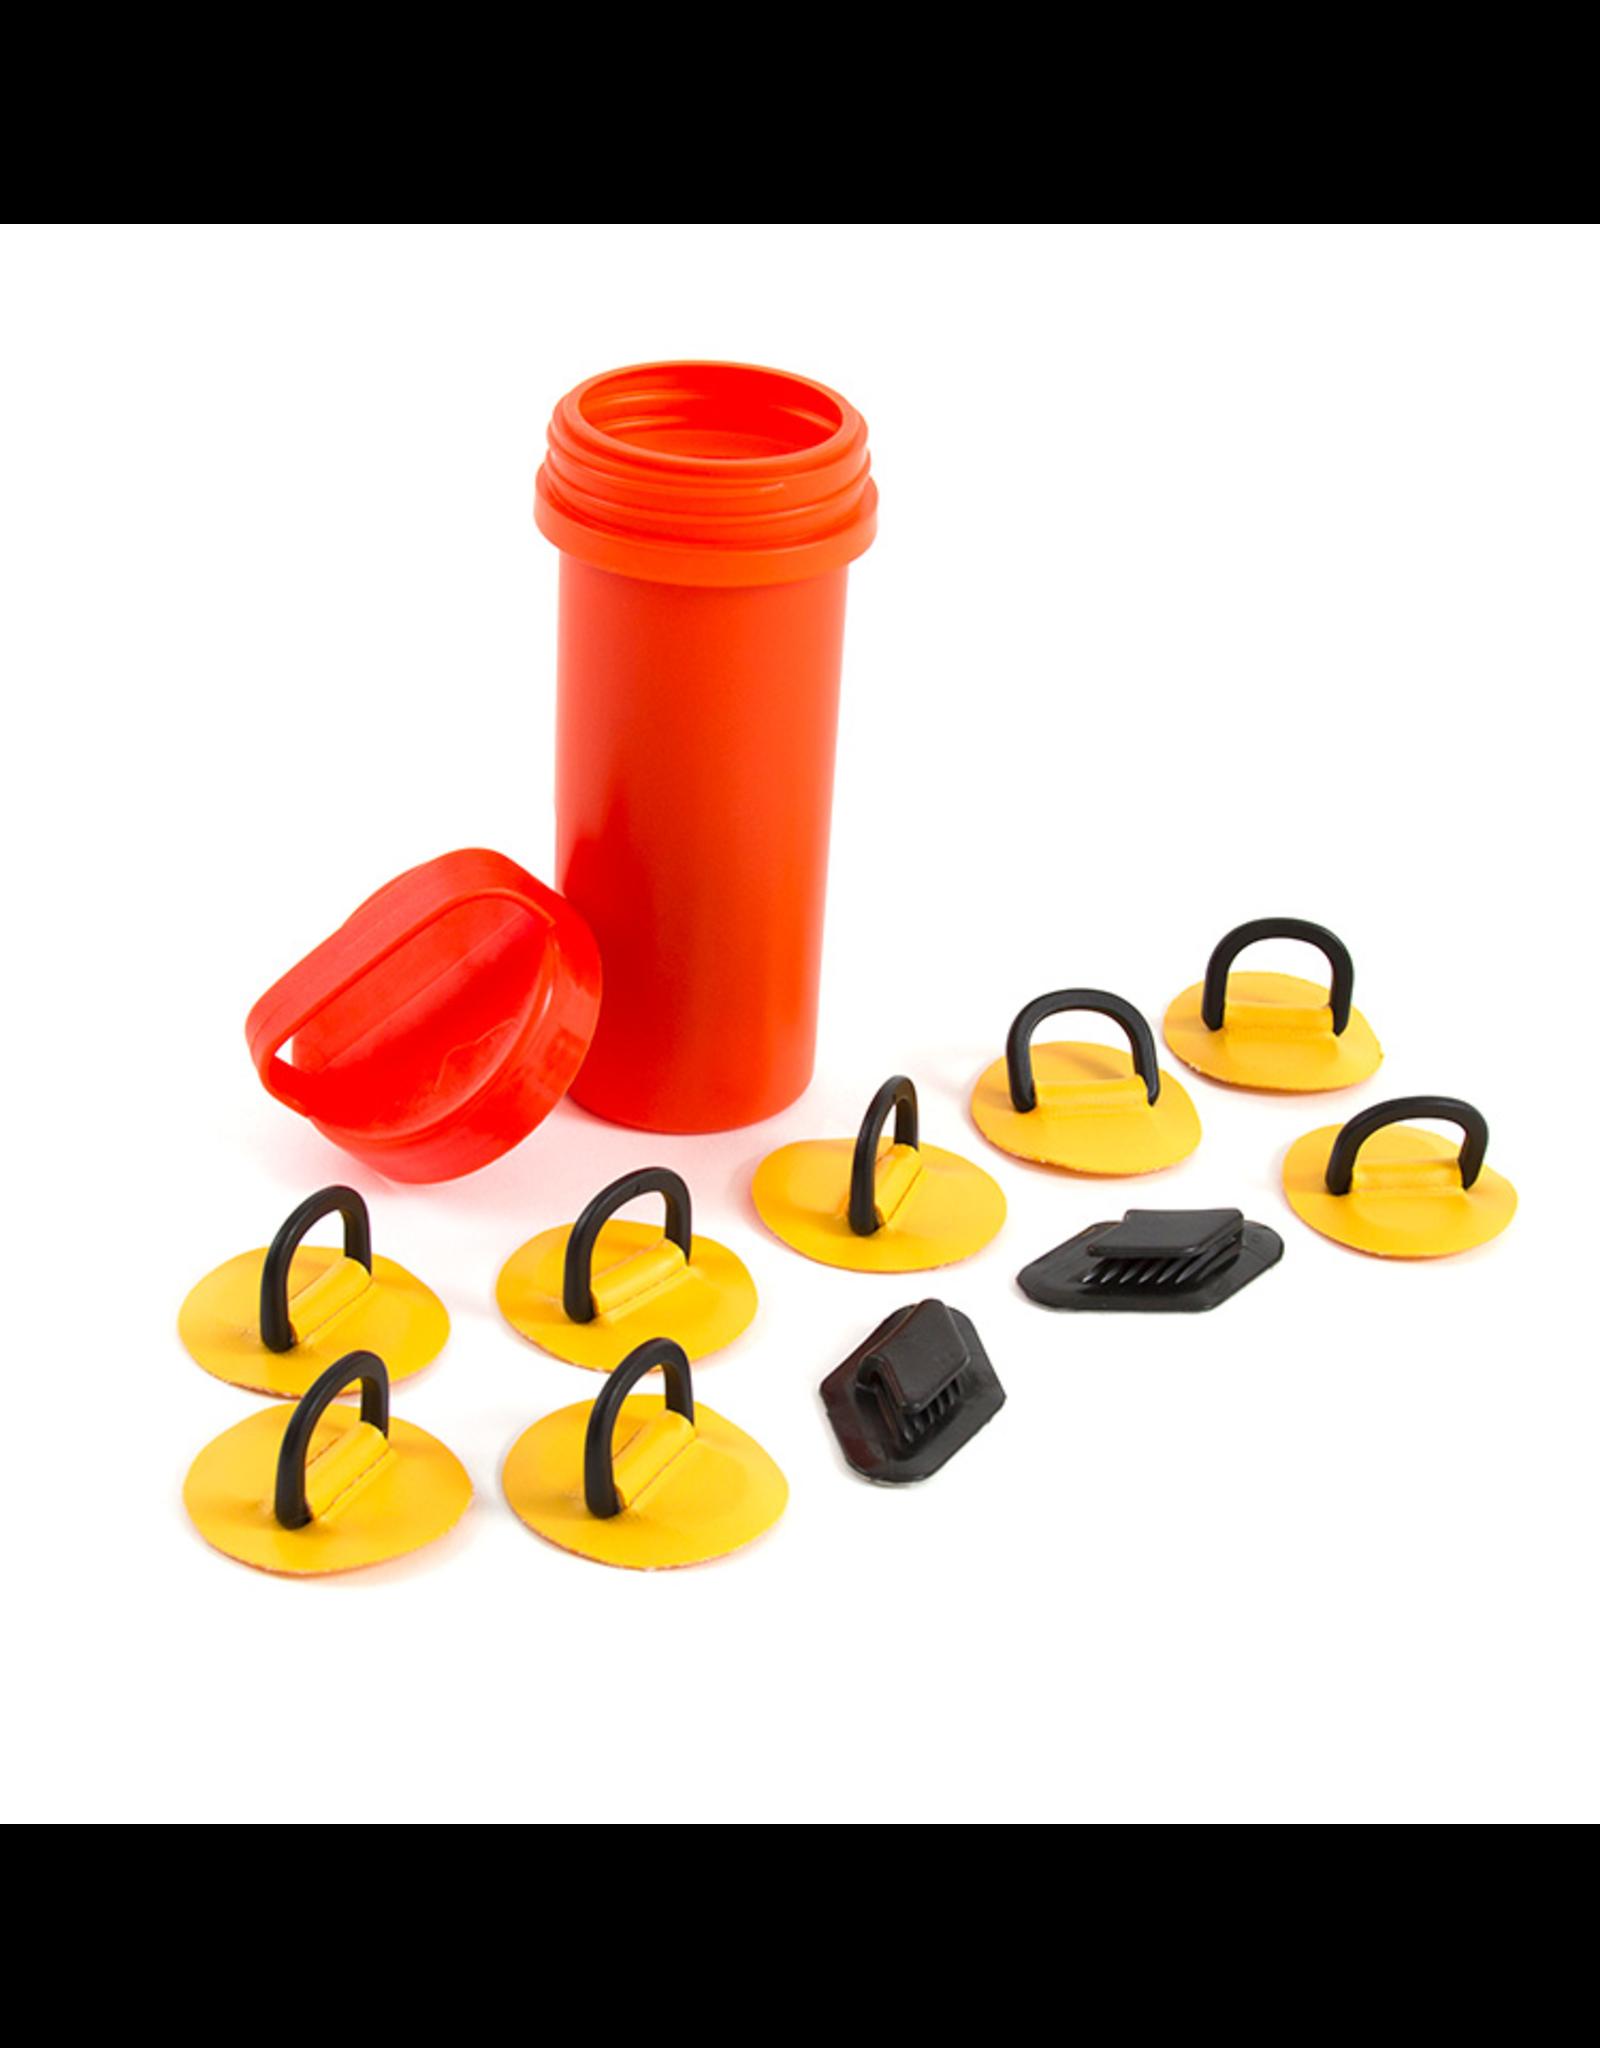 Hobie Hobie Hardware Accessory Kit for Hobie Inflatable Kayaks